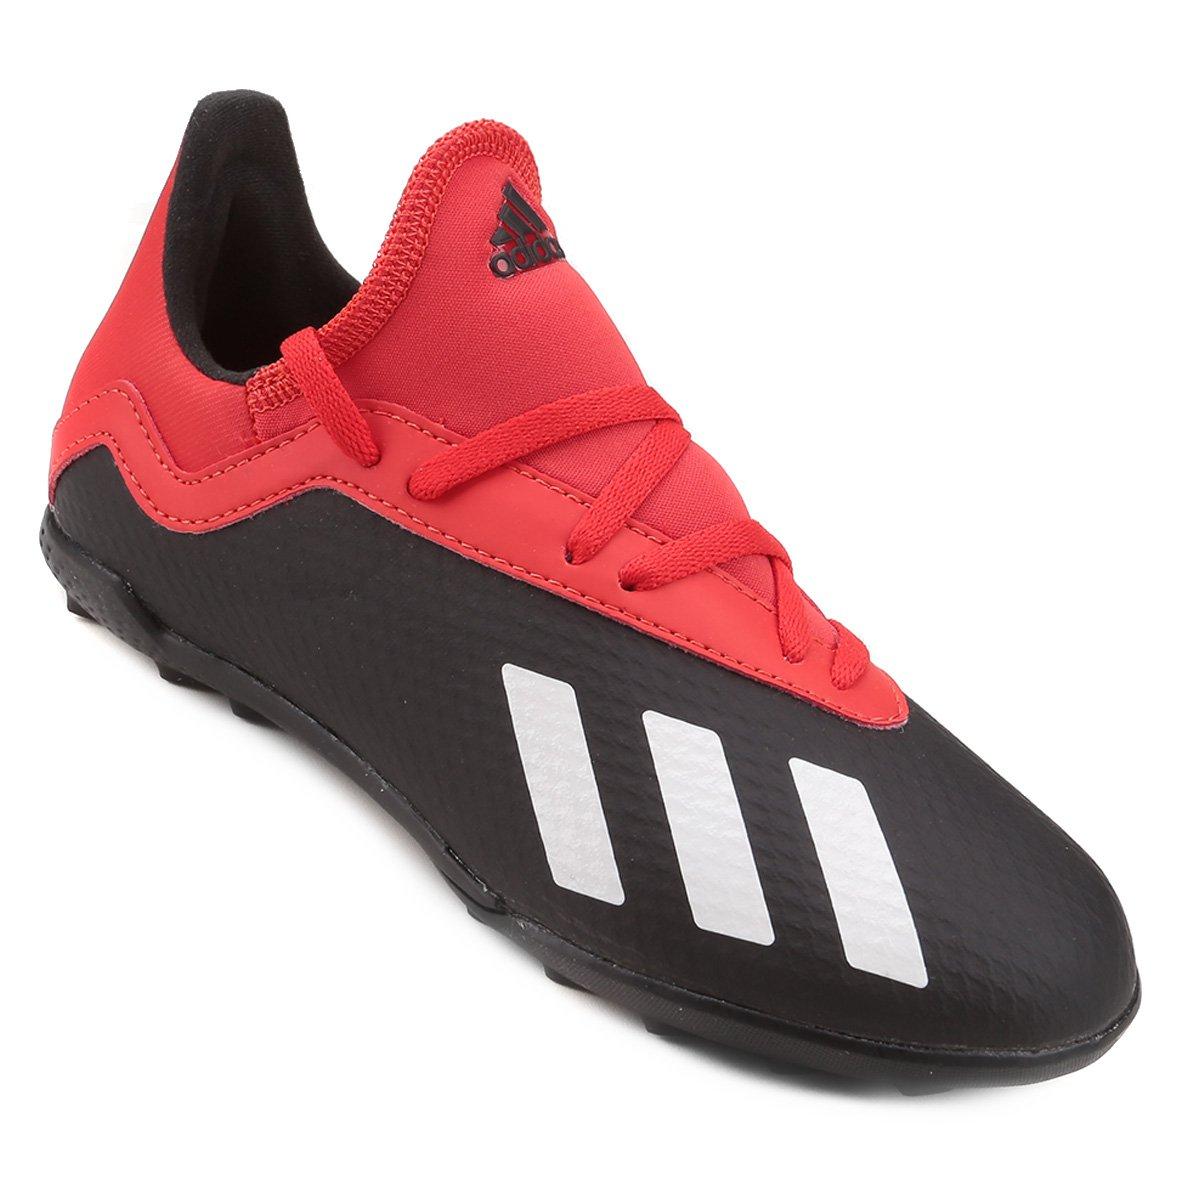 f6fccfff74 Chuteira Society Infantil Adidas X 18 3 TF - Compre Agora